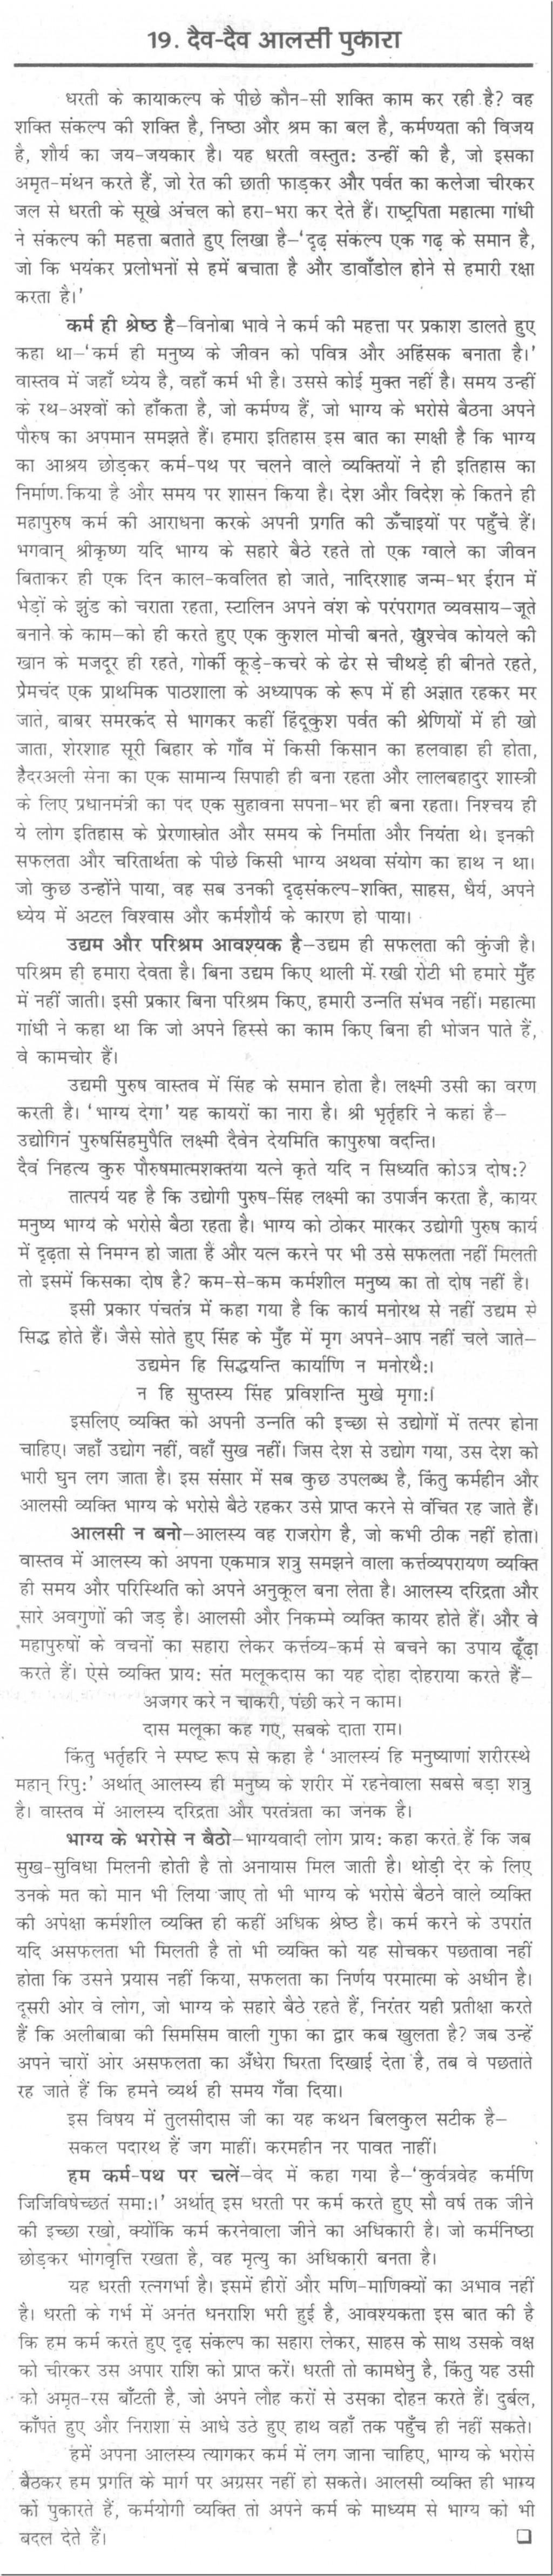 020 Hard Work Essay Example 00013 Thumb Wonderful Pdf Pays Off In Hindi Writing Large